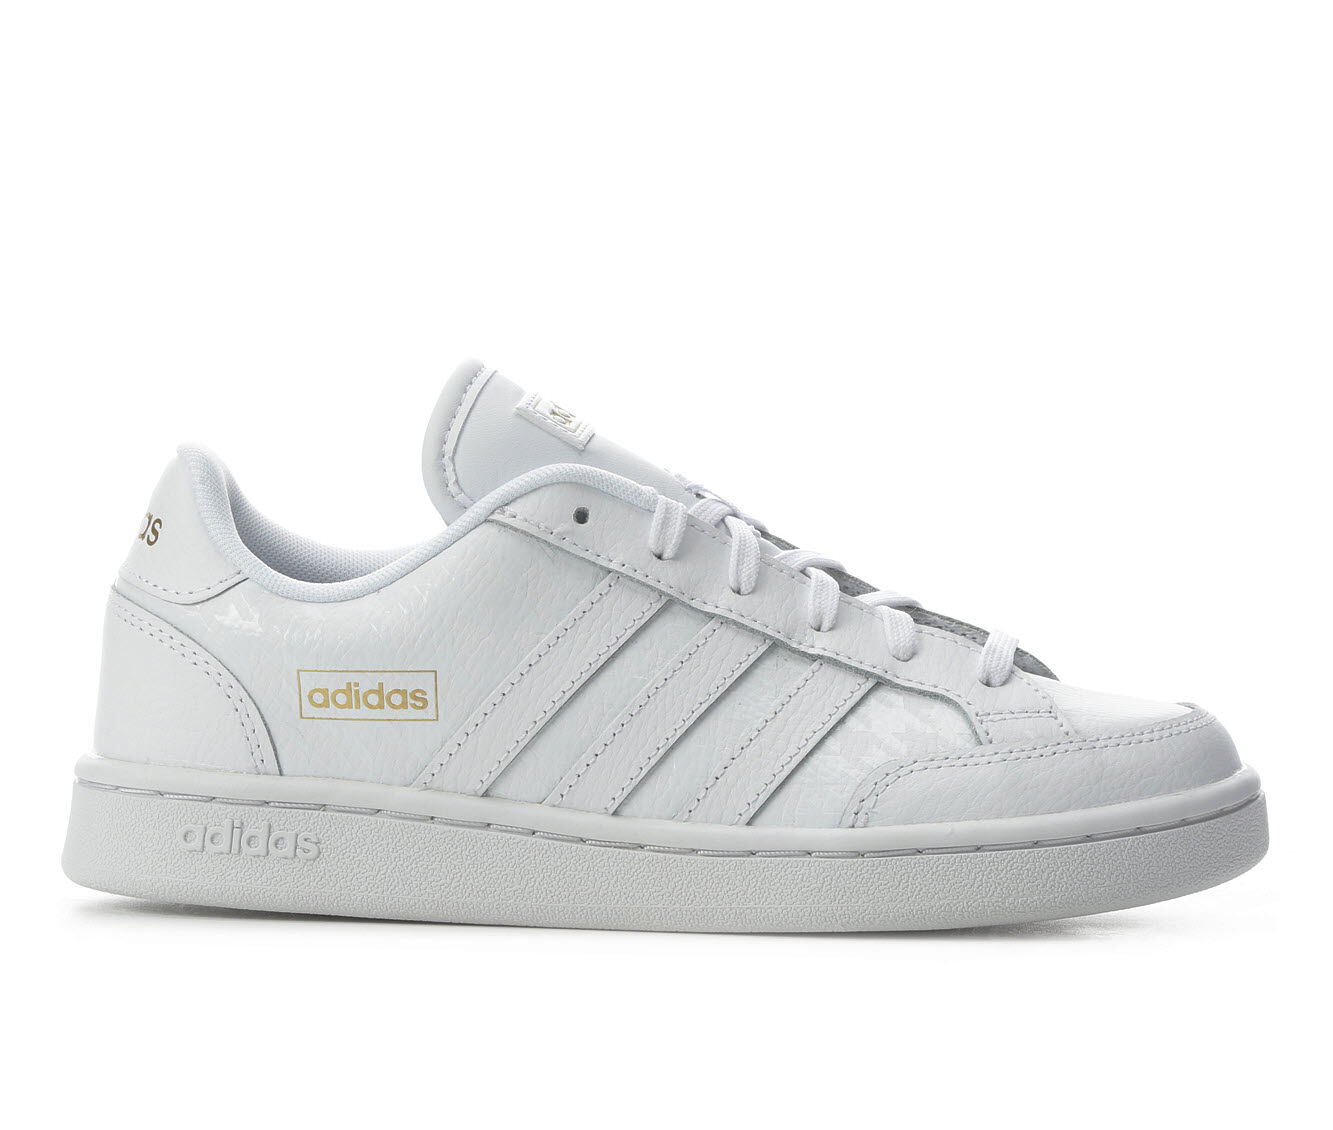 adidas Women's Shoes, Sneakers, & Slip-Ons | Shoe Carnival